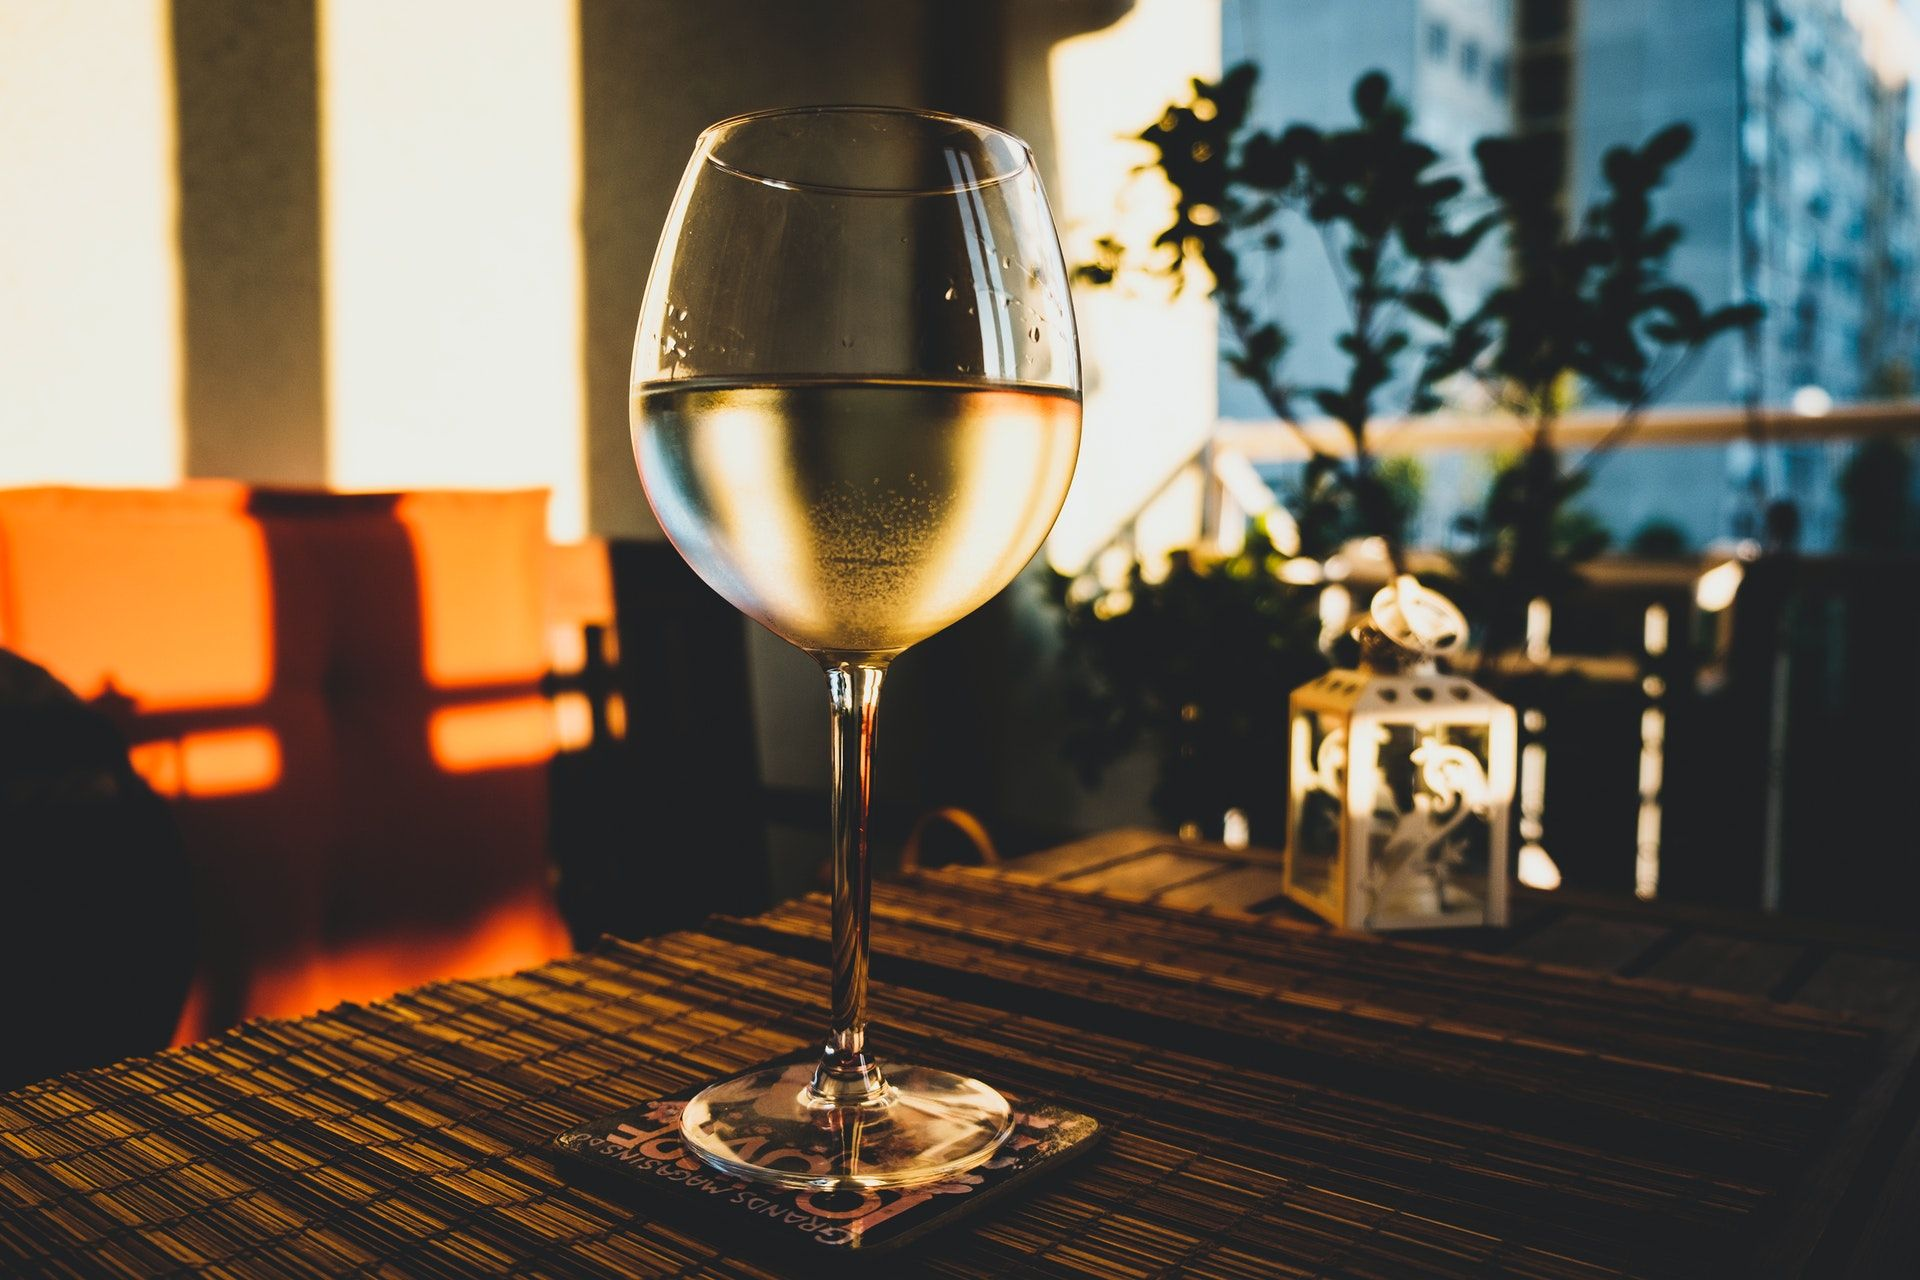 Glass of Chardonnay wine